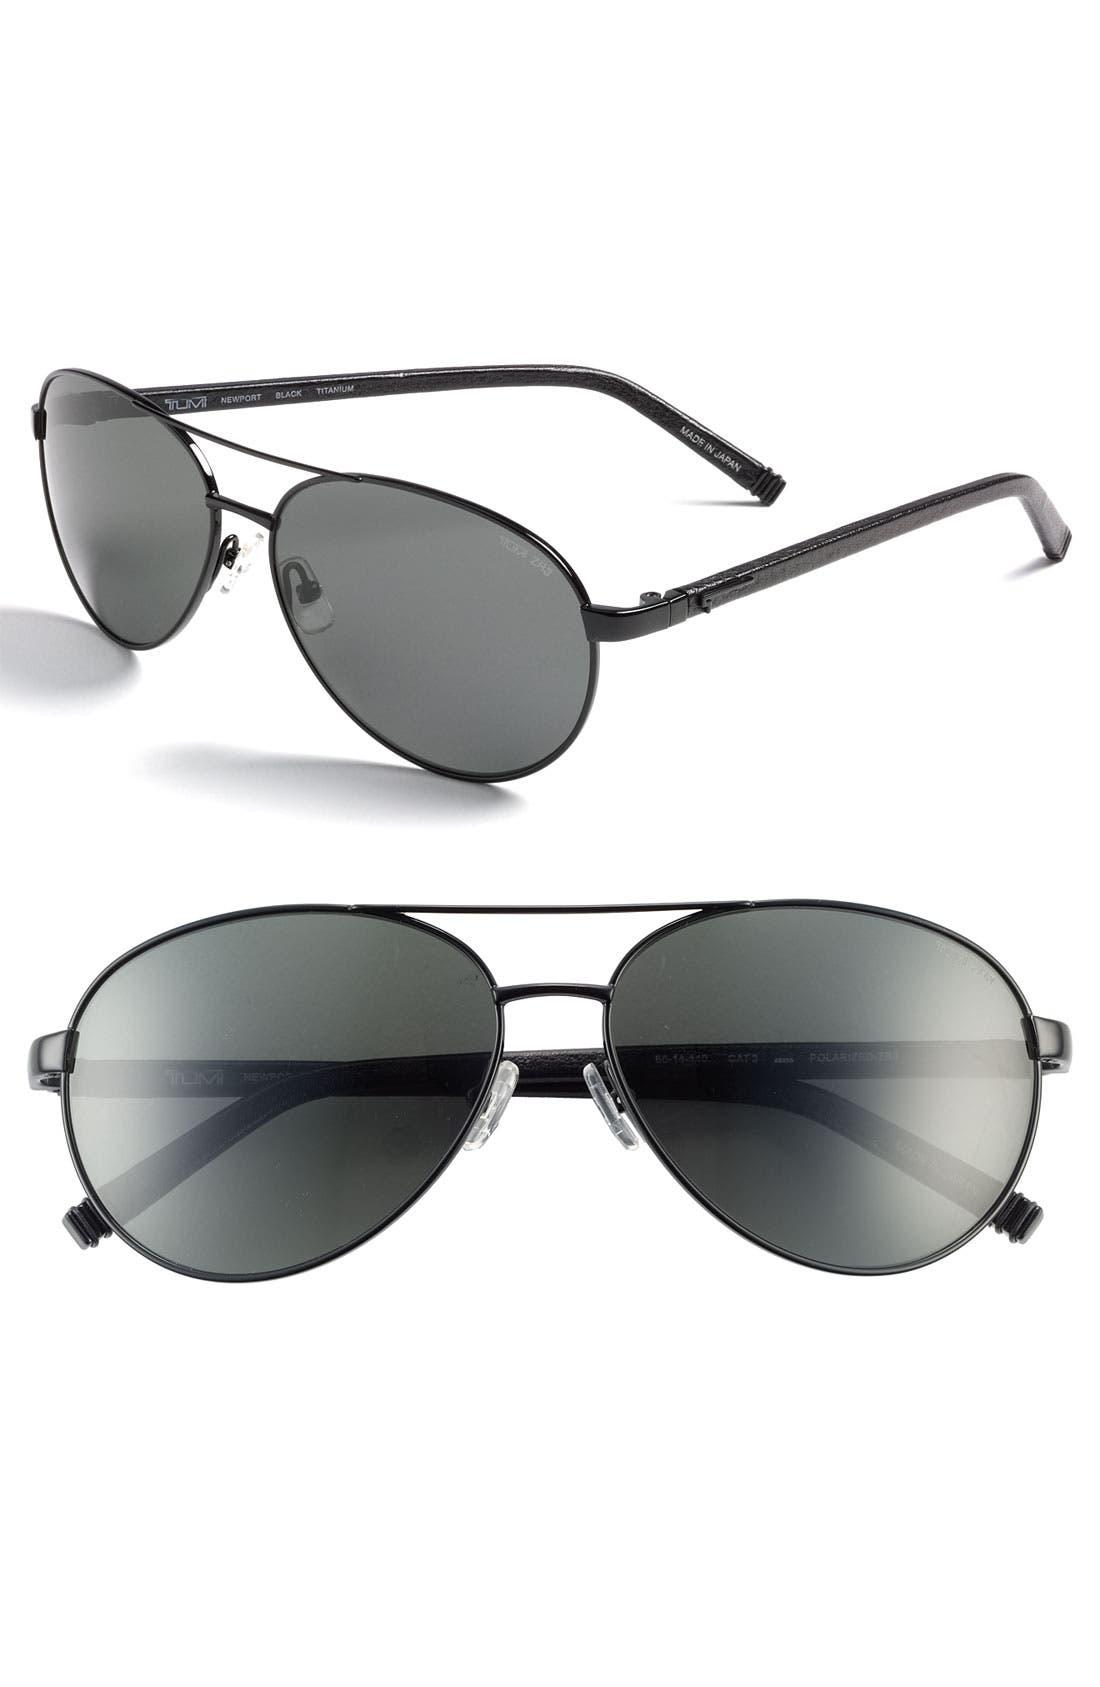 Alternate Image 1 Selected - Tumi 'Newport' Polarized Sunglasses